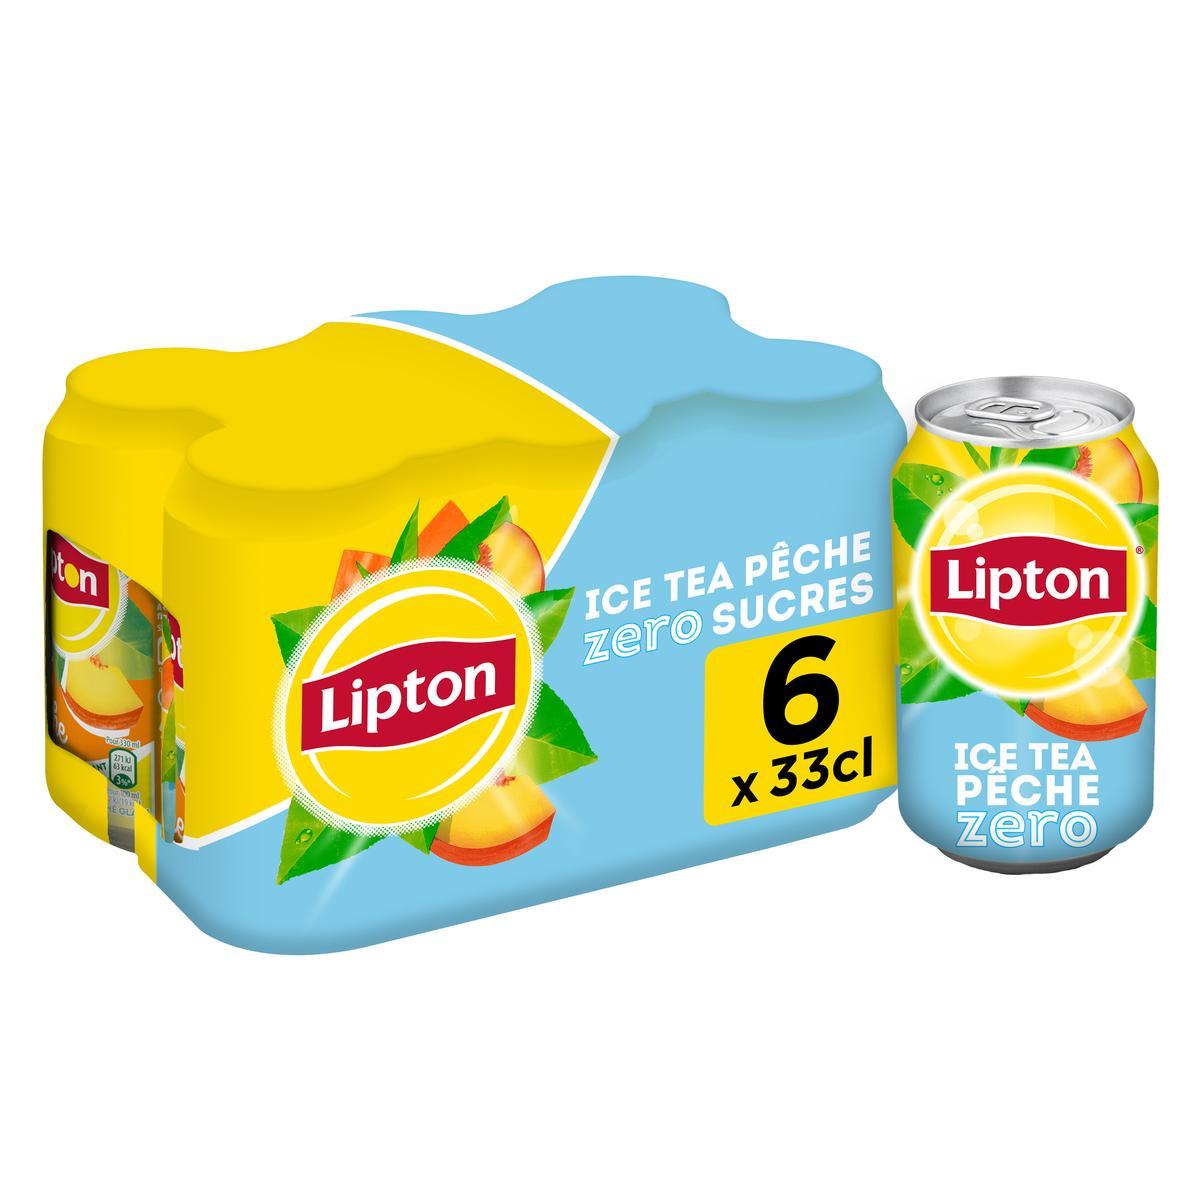 Pack de Lipton Ice Tea pêche zéro (6 x 33 cl)